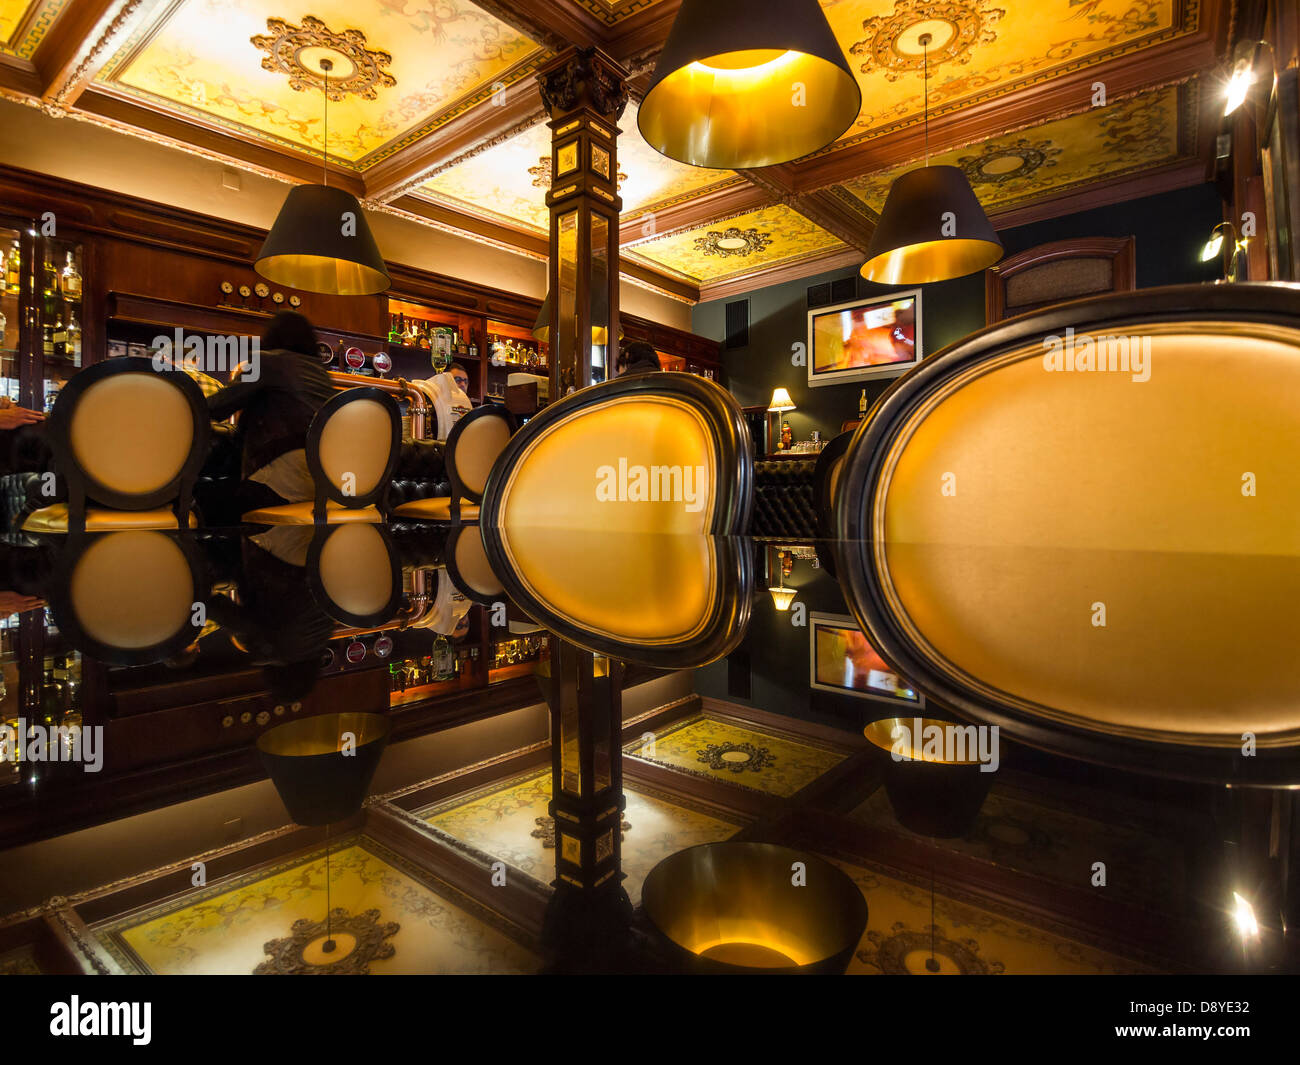 Upscale restaurant cafe interior - Stock Image